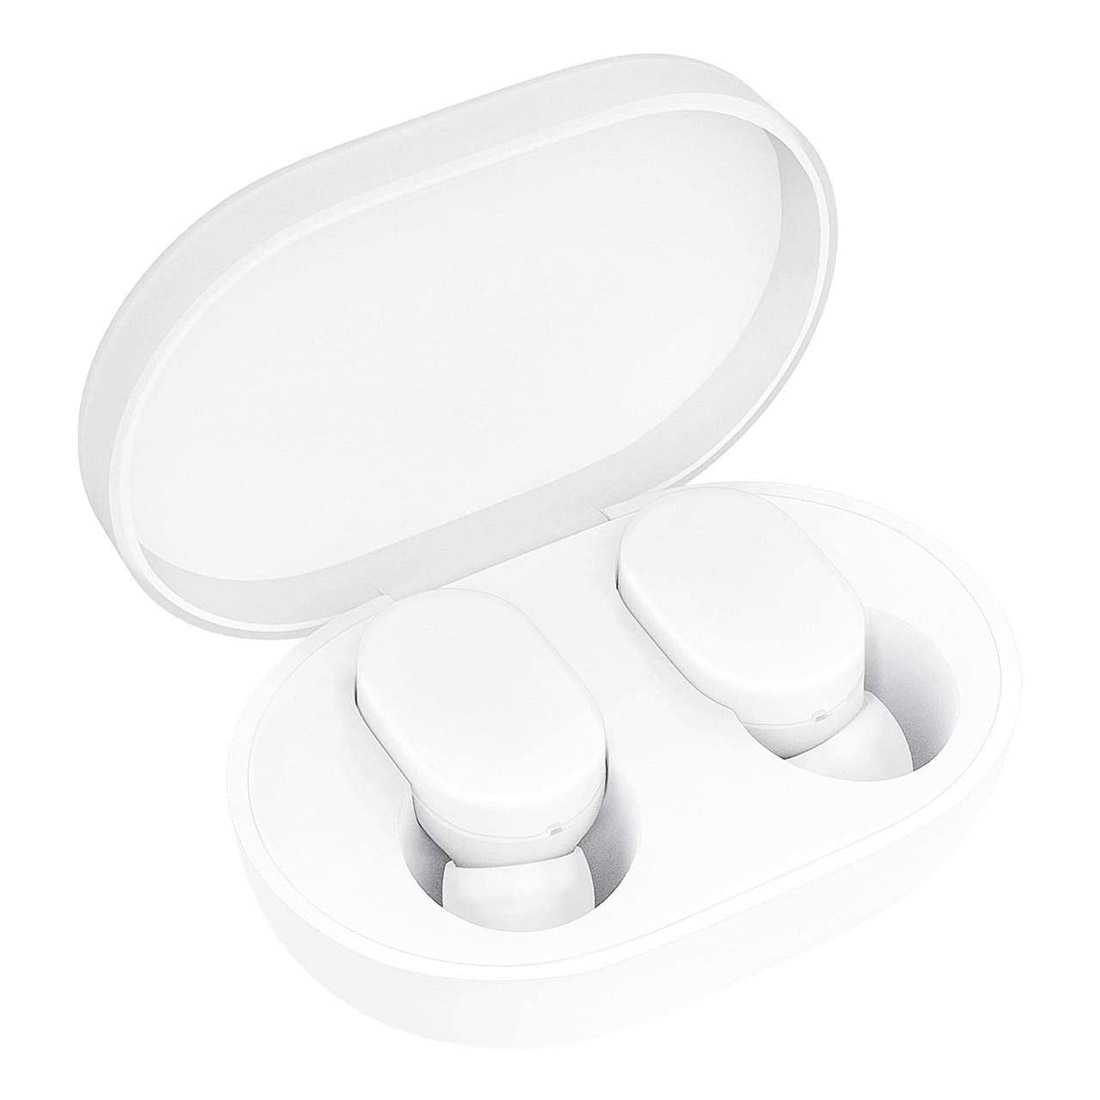 Xiaomi Mi TWS True Wireless Earphones - White